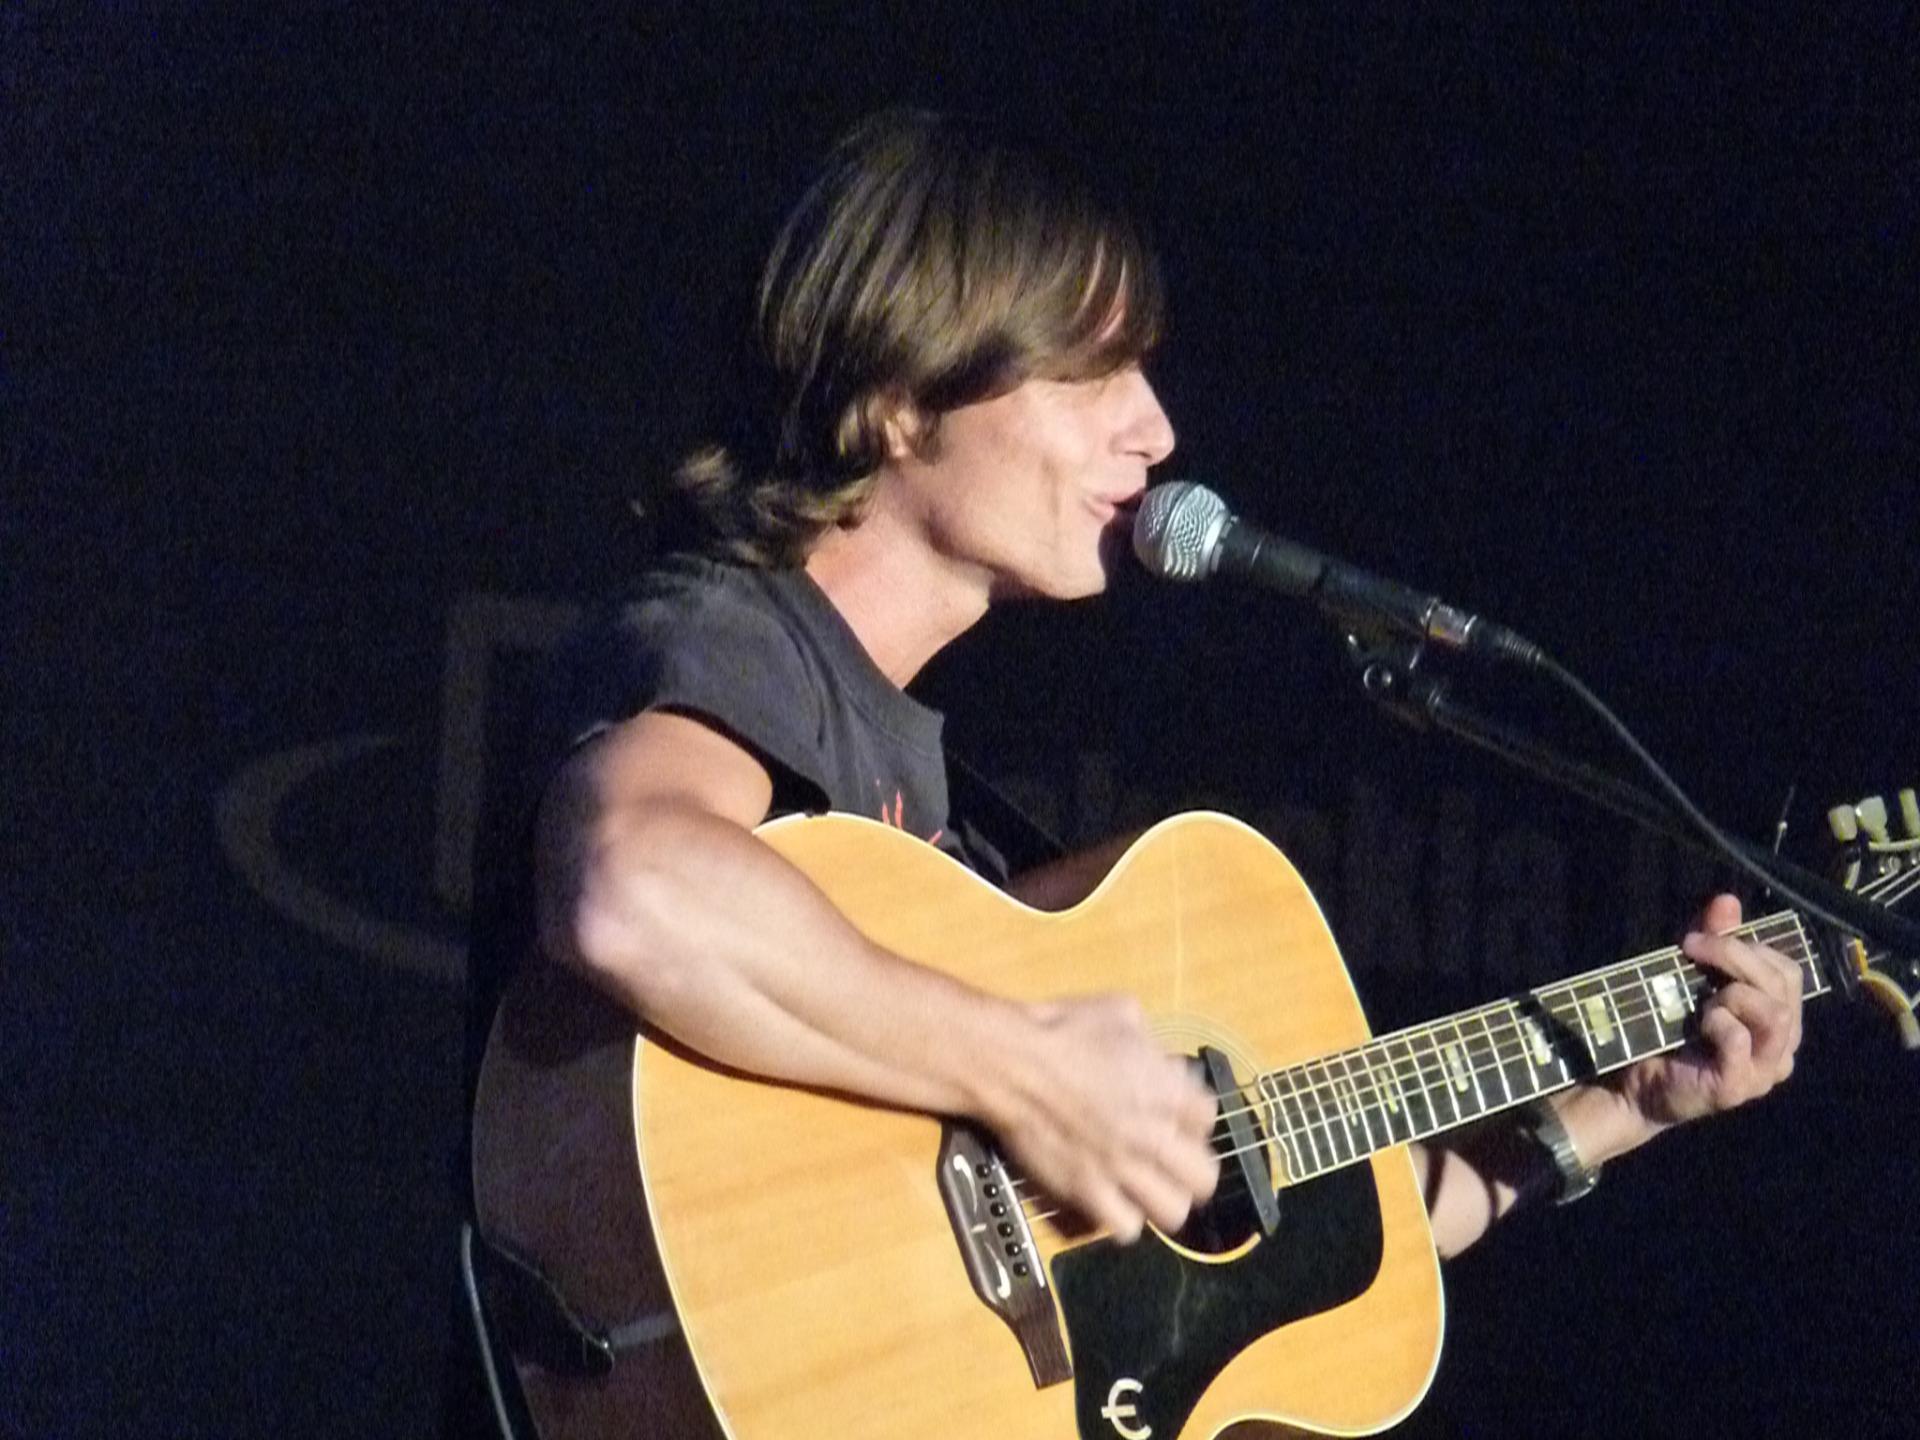 Jamie Nattier